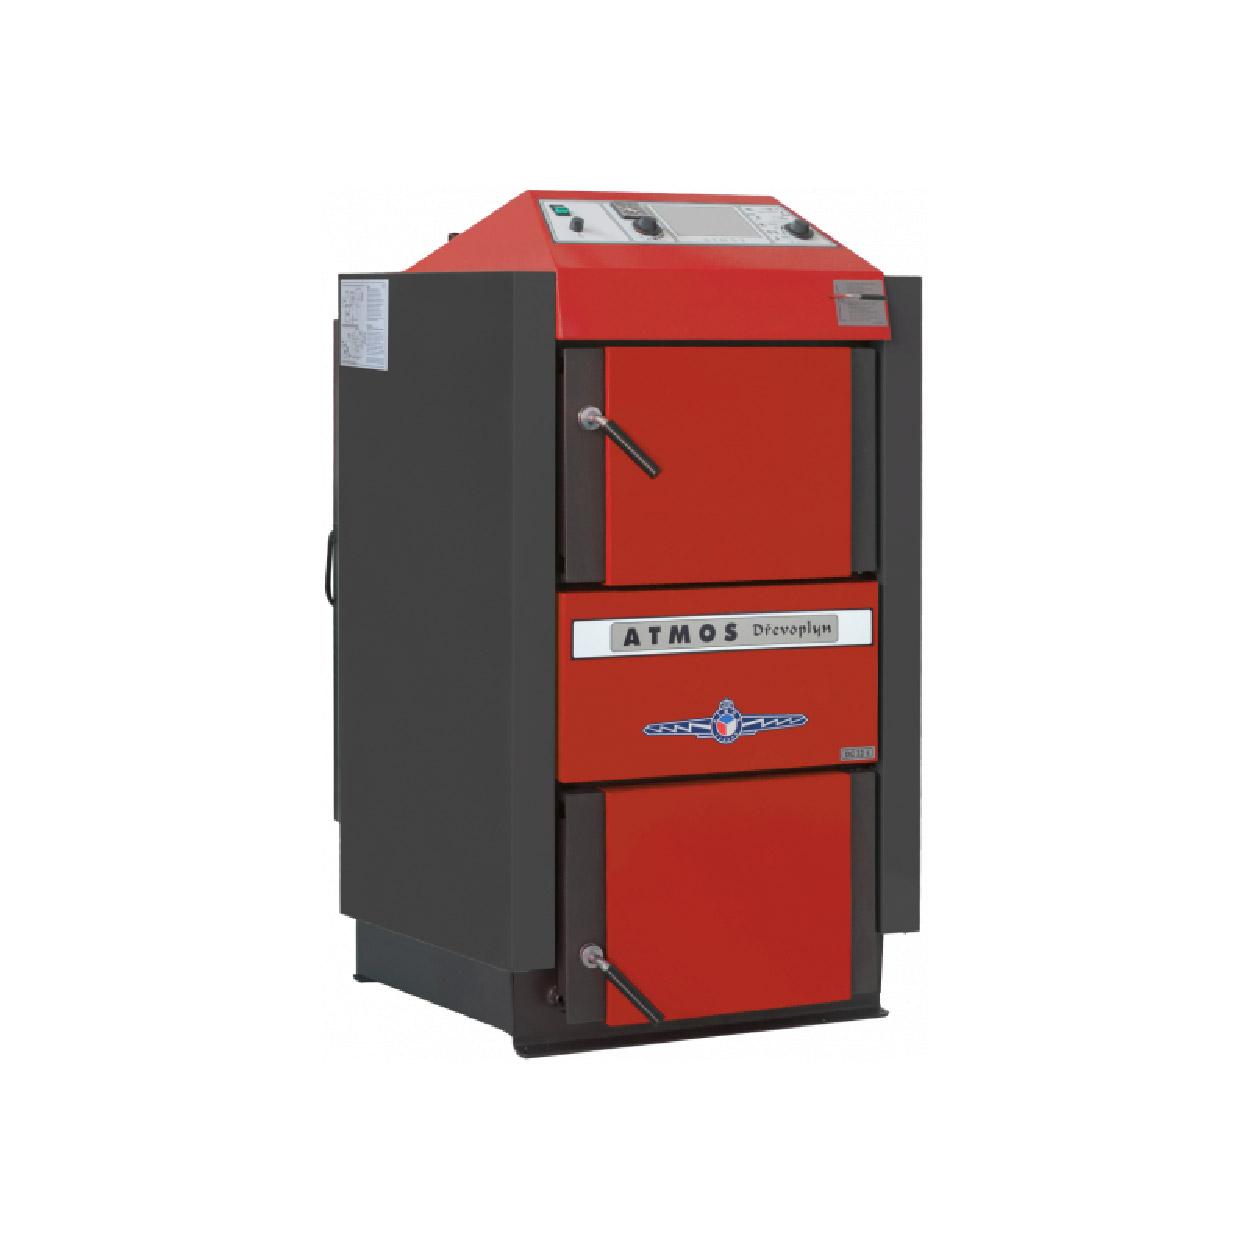 Centrala termica pe lemne ATMOS DC22S 22 kw fornello imagine